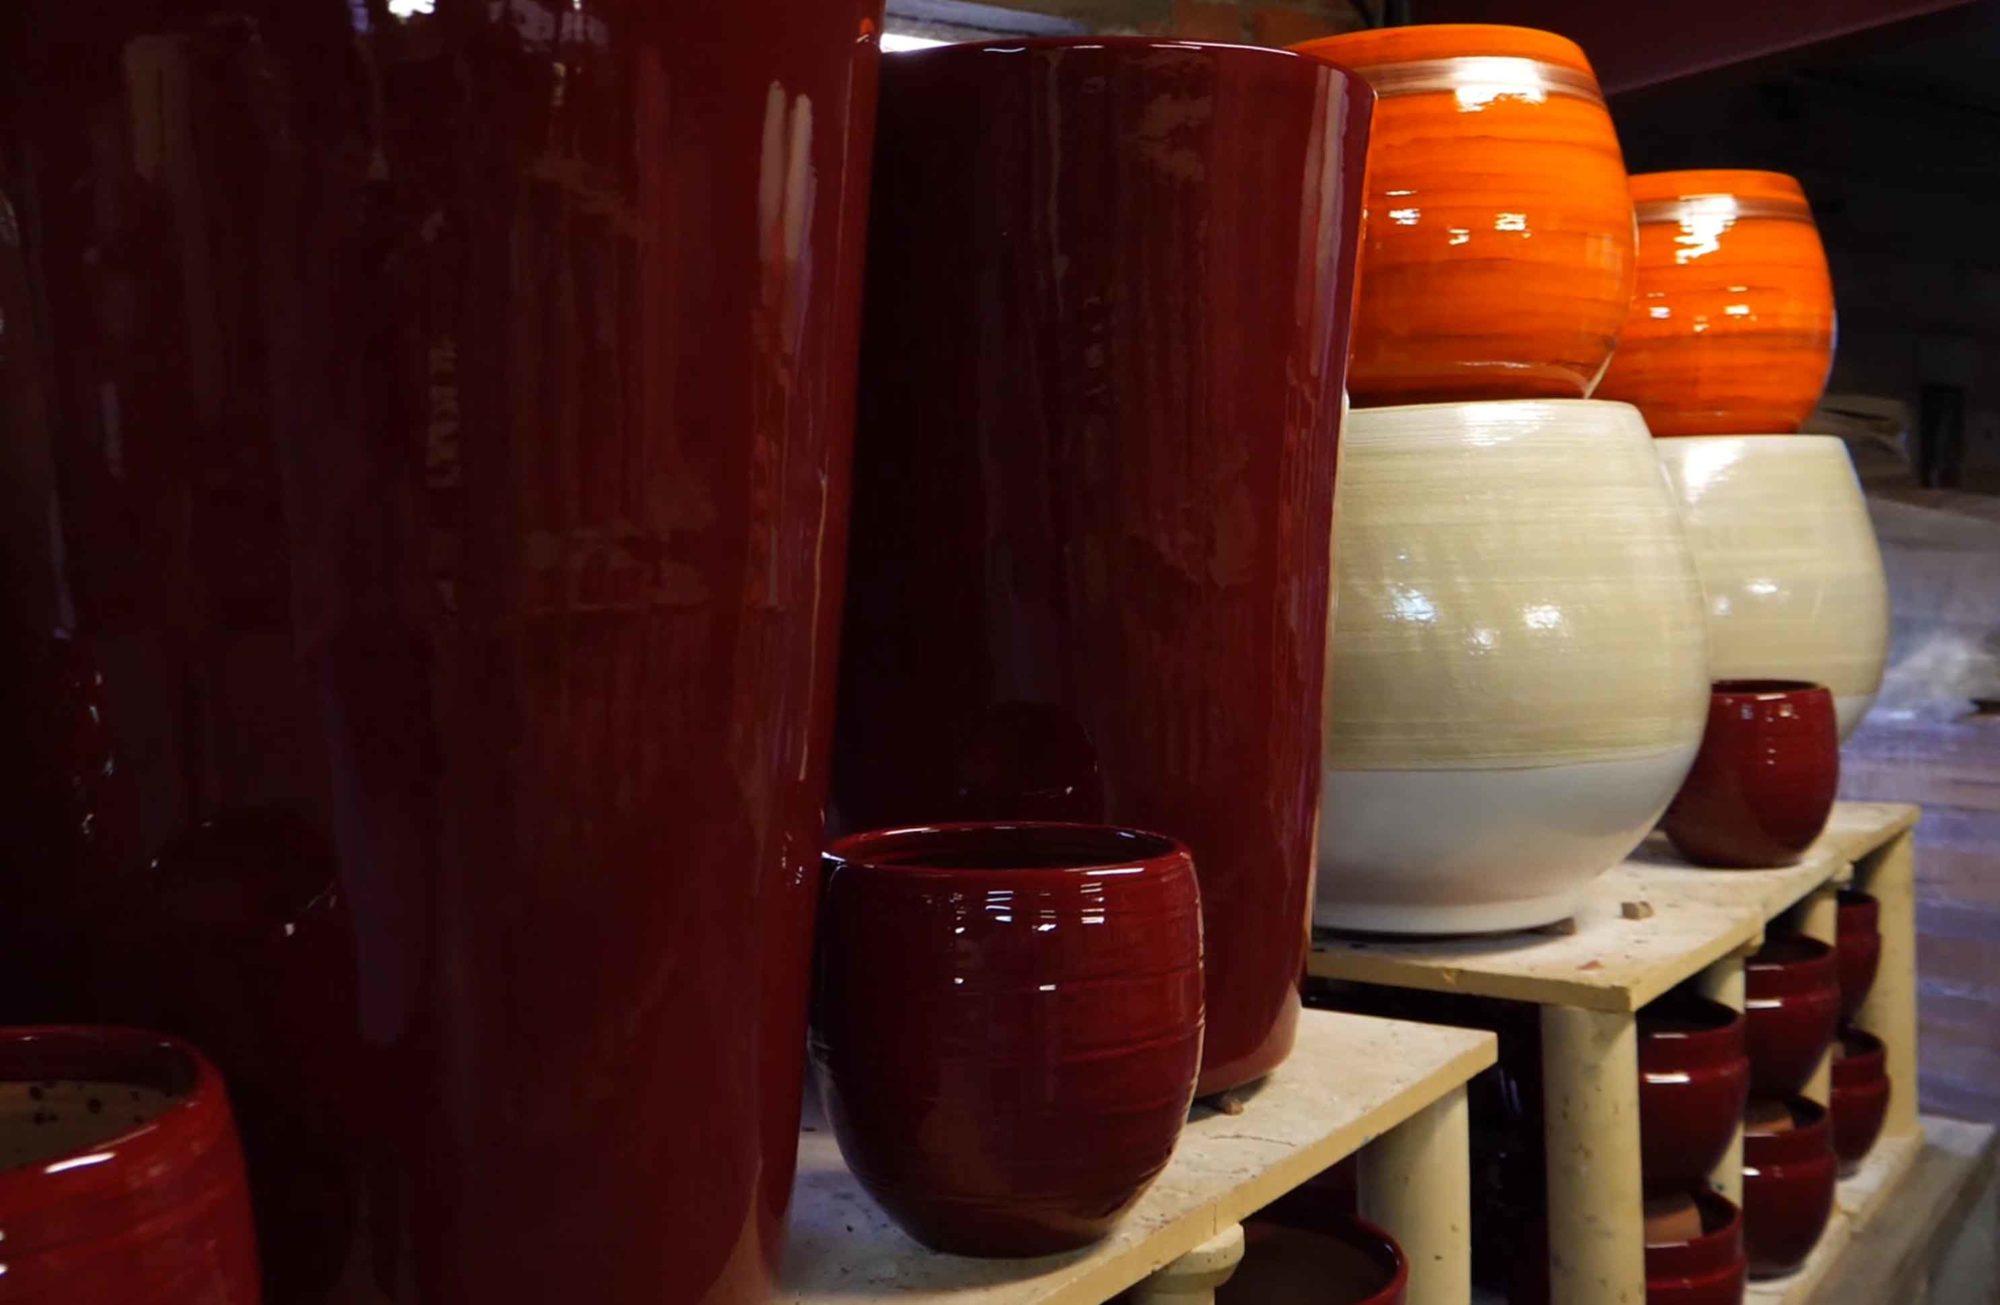 les poteries d 39 albi depuis mon hamac. Black Bedroom Furniture Sets. Home Design Ideas